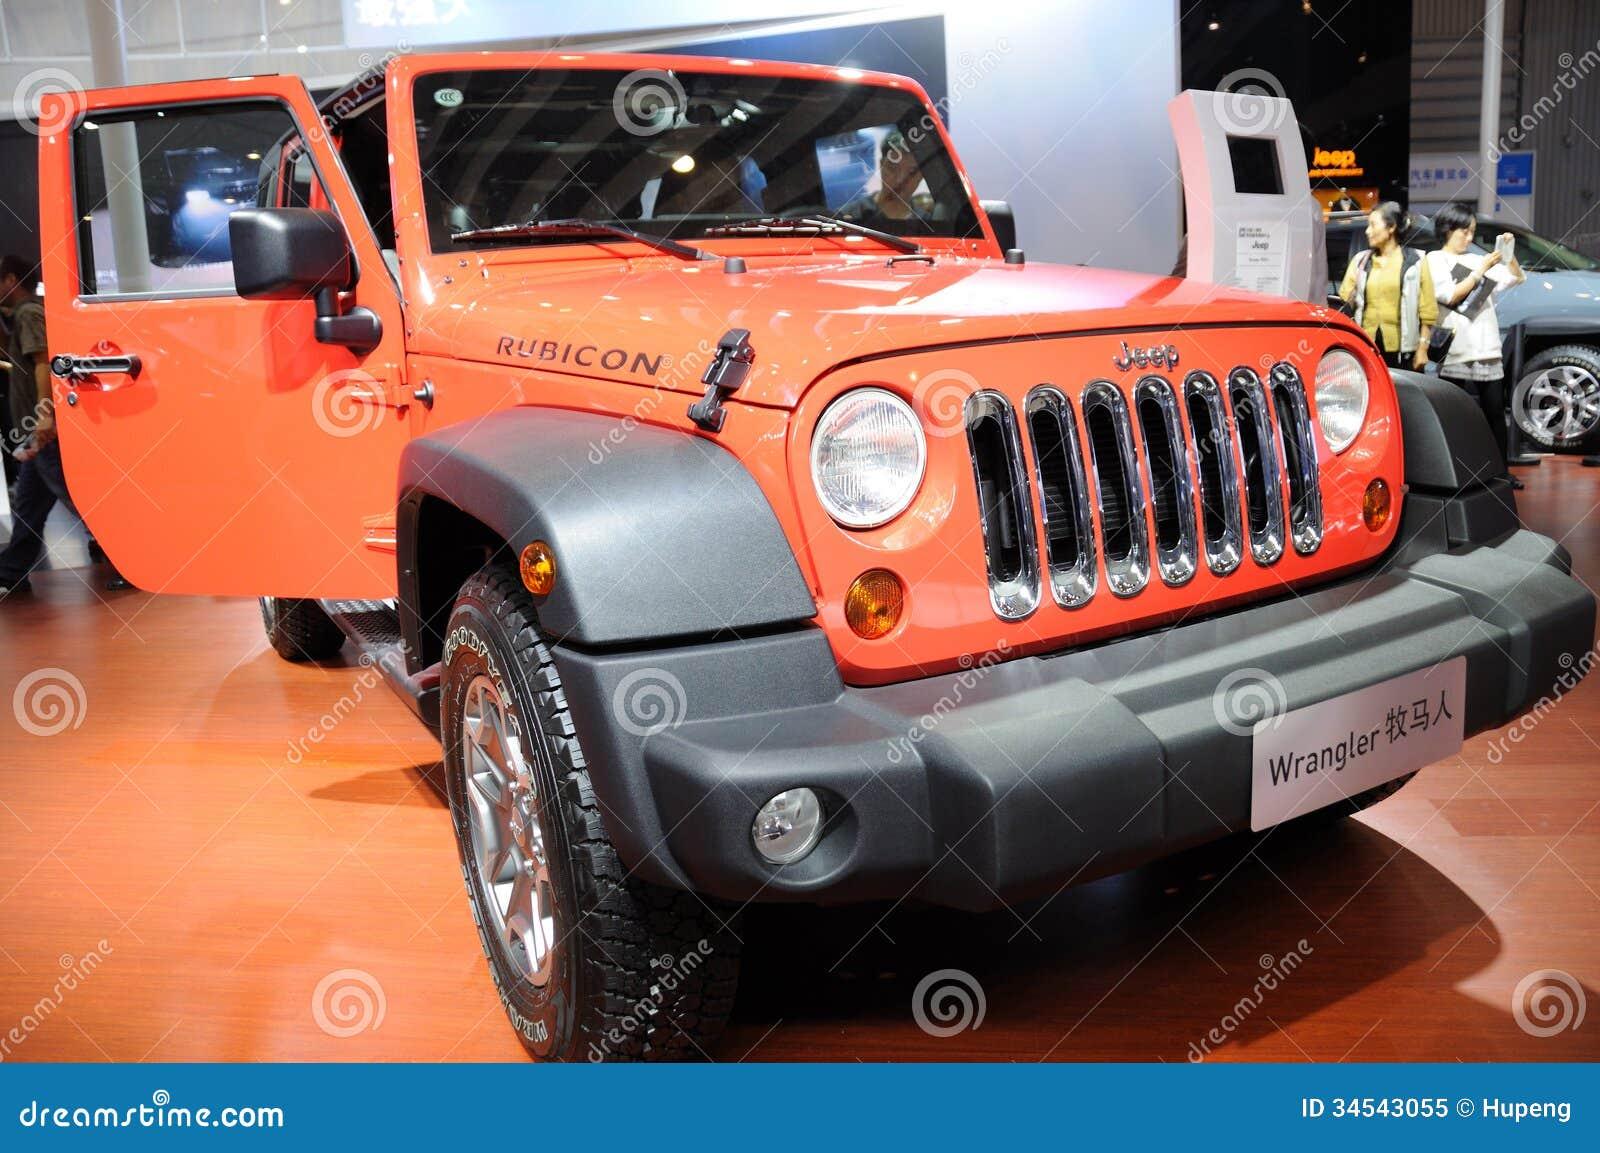 Jeep Anaranjado Wrangler Rubicon Imagen Editorial De Expo